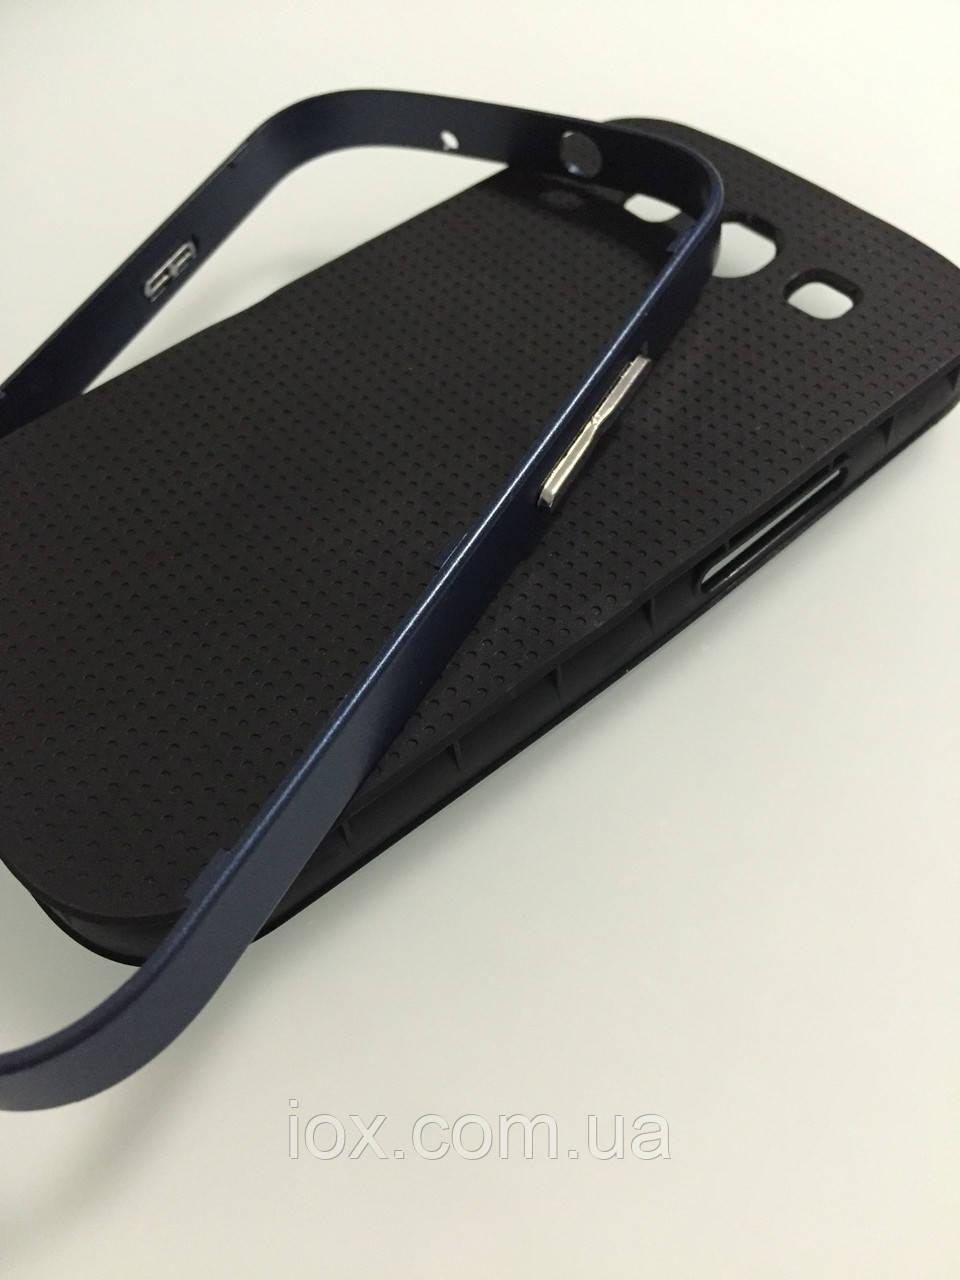 Чехол + бампер на Samsung GalaxyS3 (i9300) и S3 duos